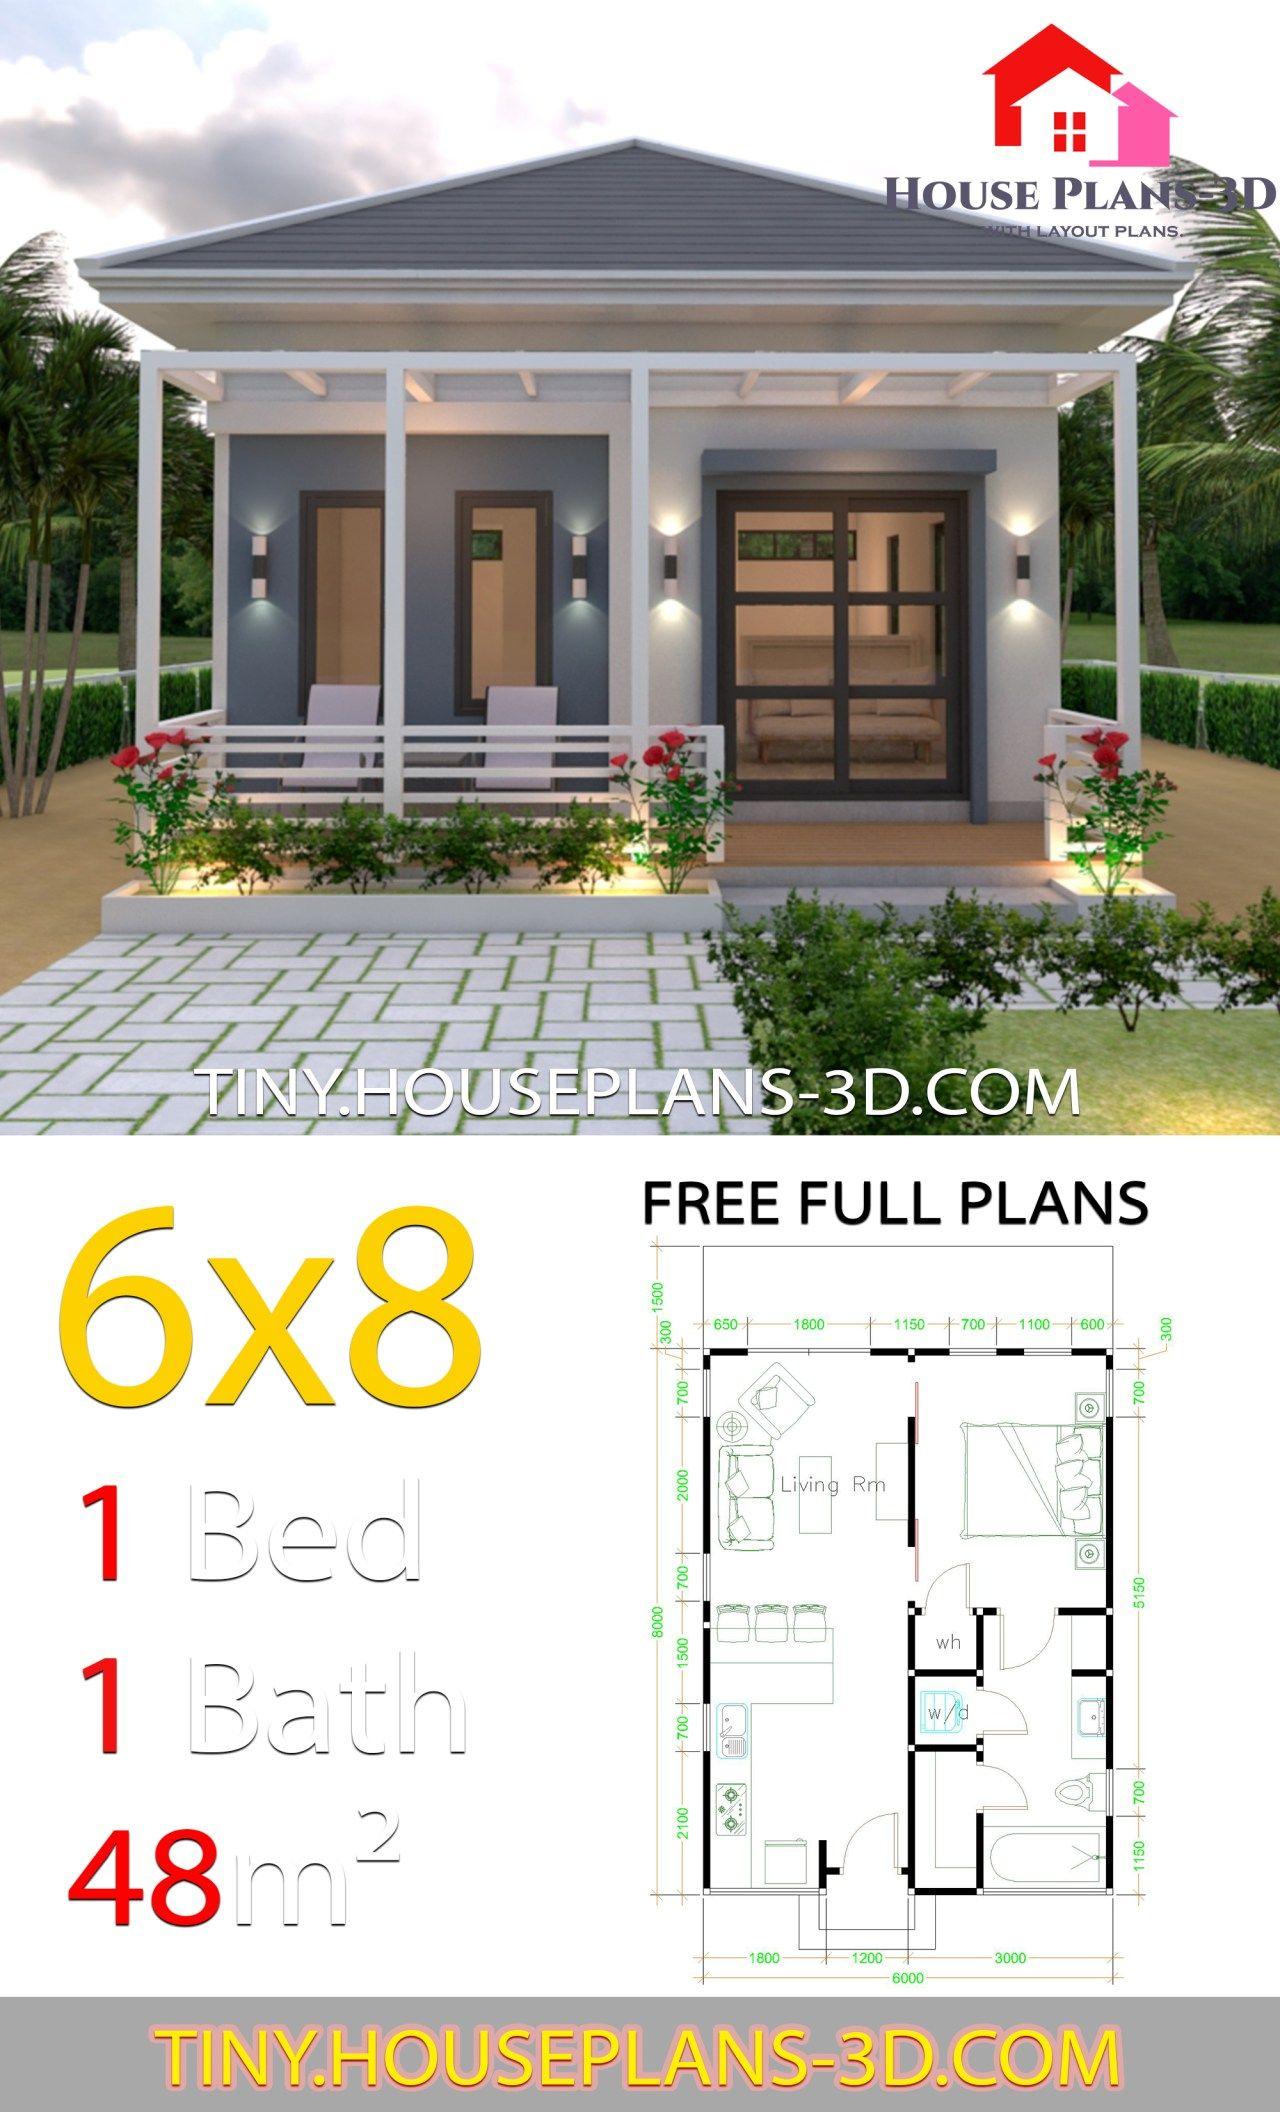 Studio House Plans 6x8 Hip Roof Tiny House Plans House Layouts Dream House Plans Small House Plans